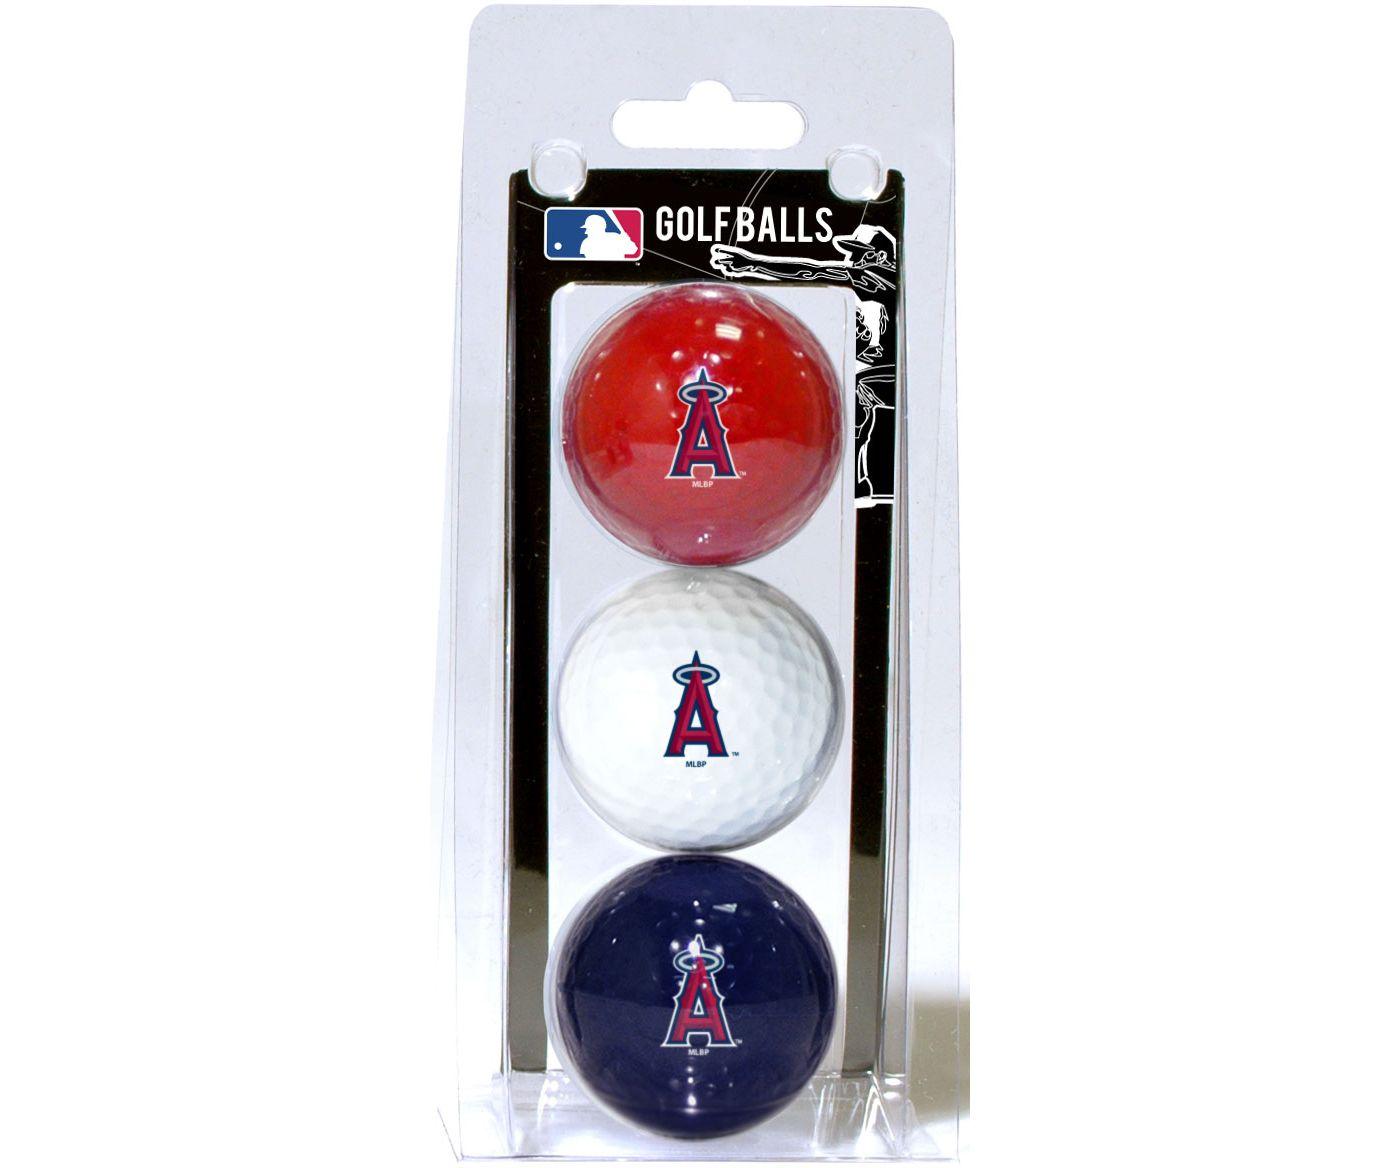 Team Golf LA Angels Golf Balls - 3 Pack